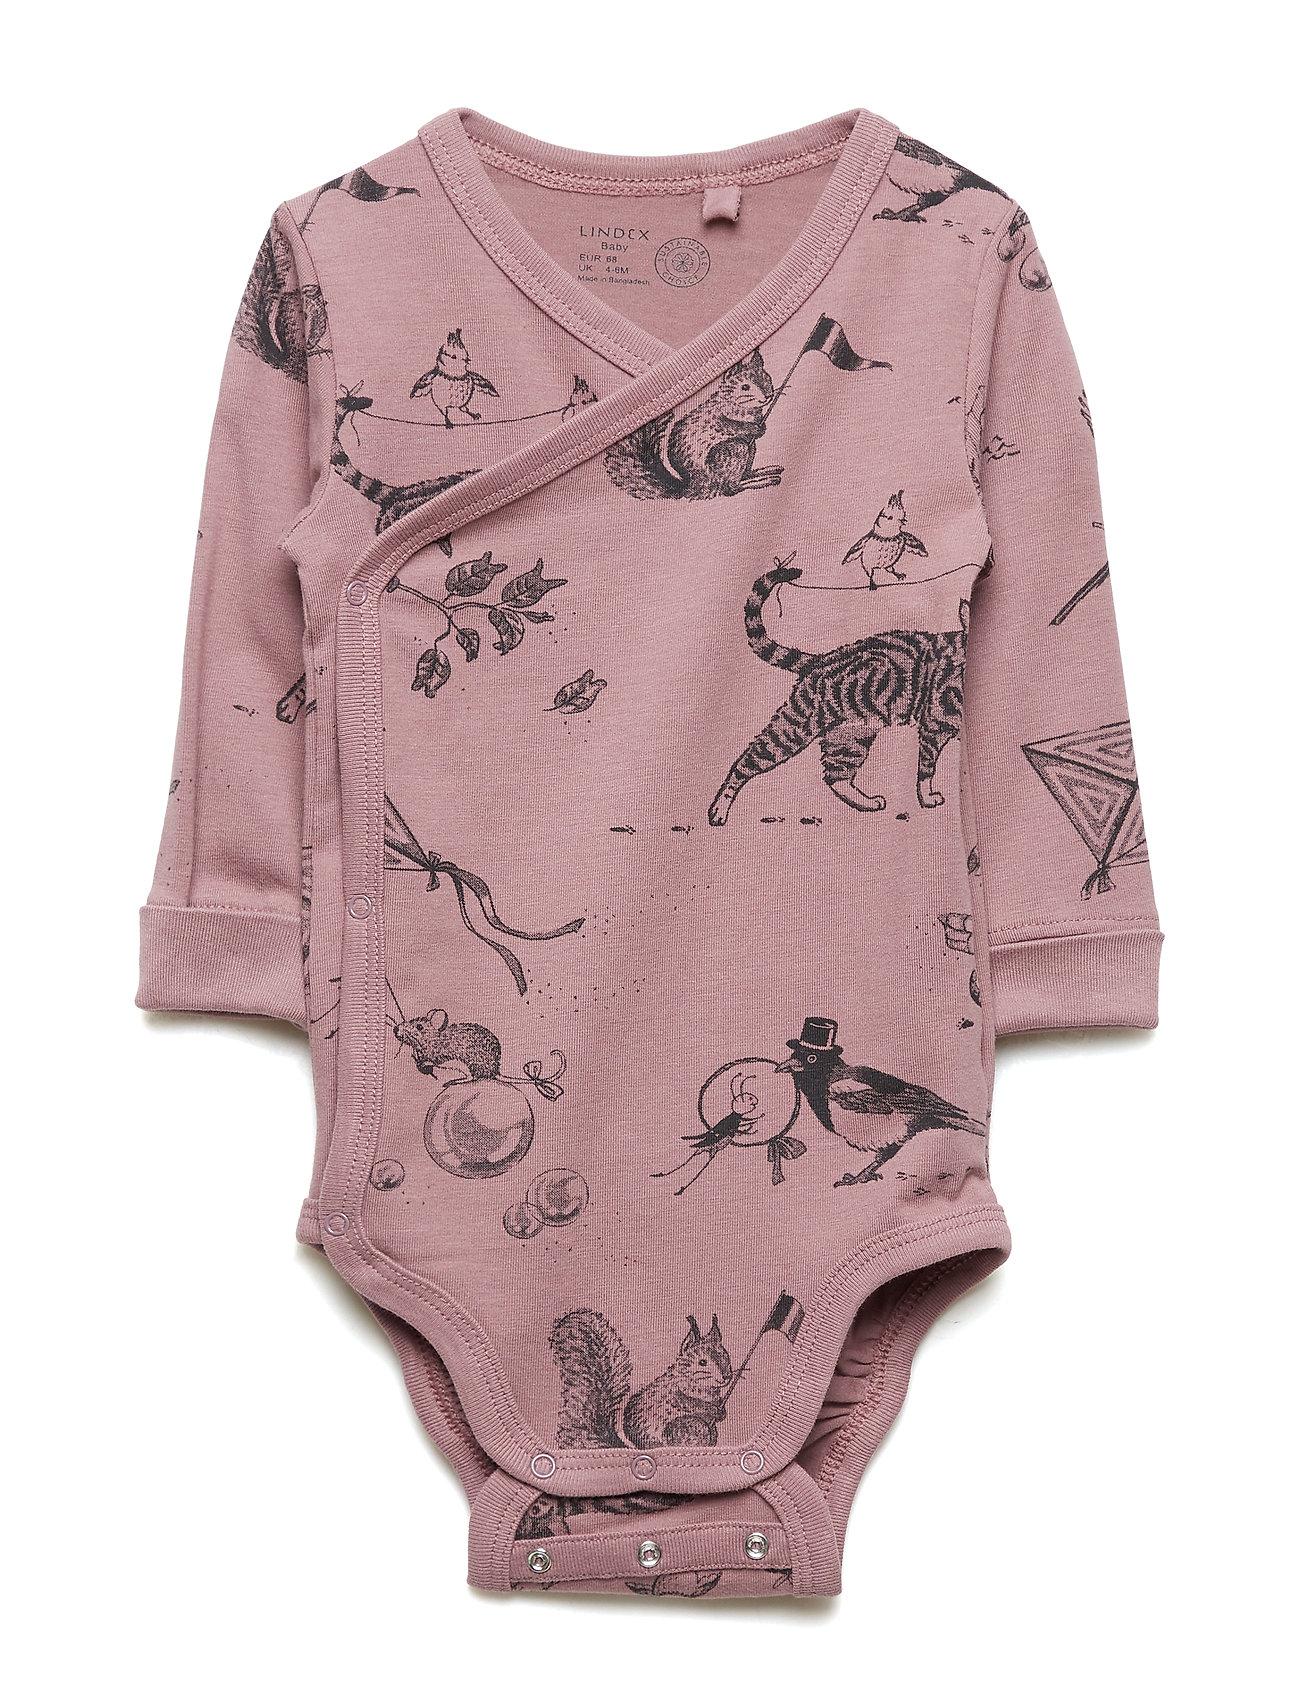 Lindex Wrap bodysuit with animal pattern - DUSTY LILAC